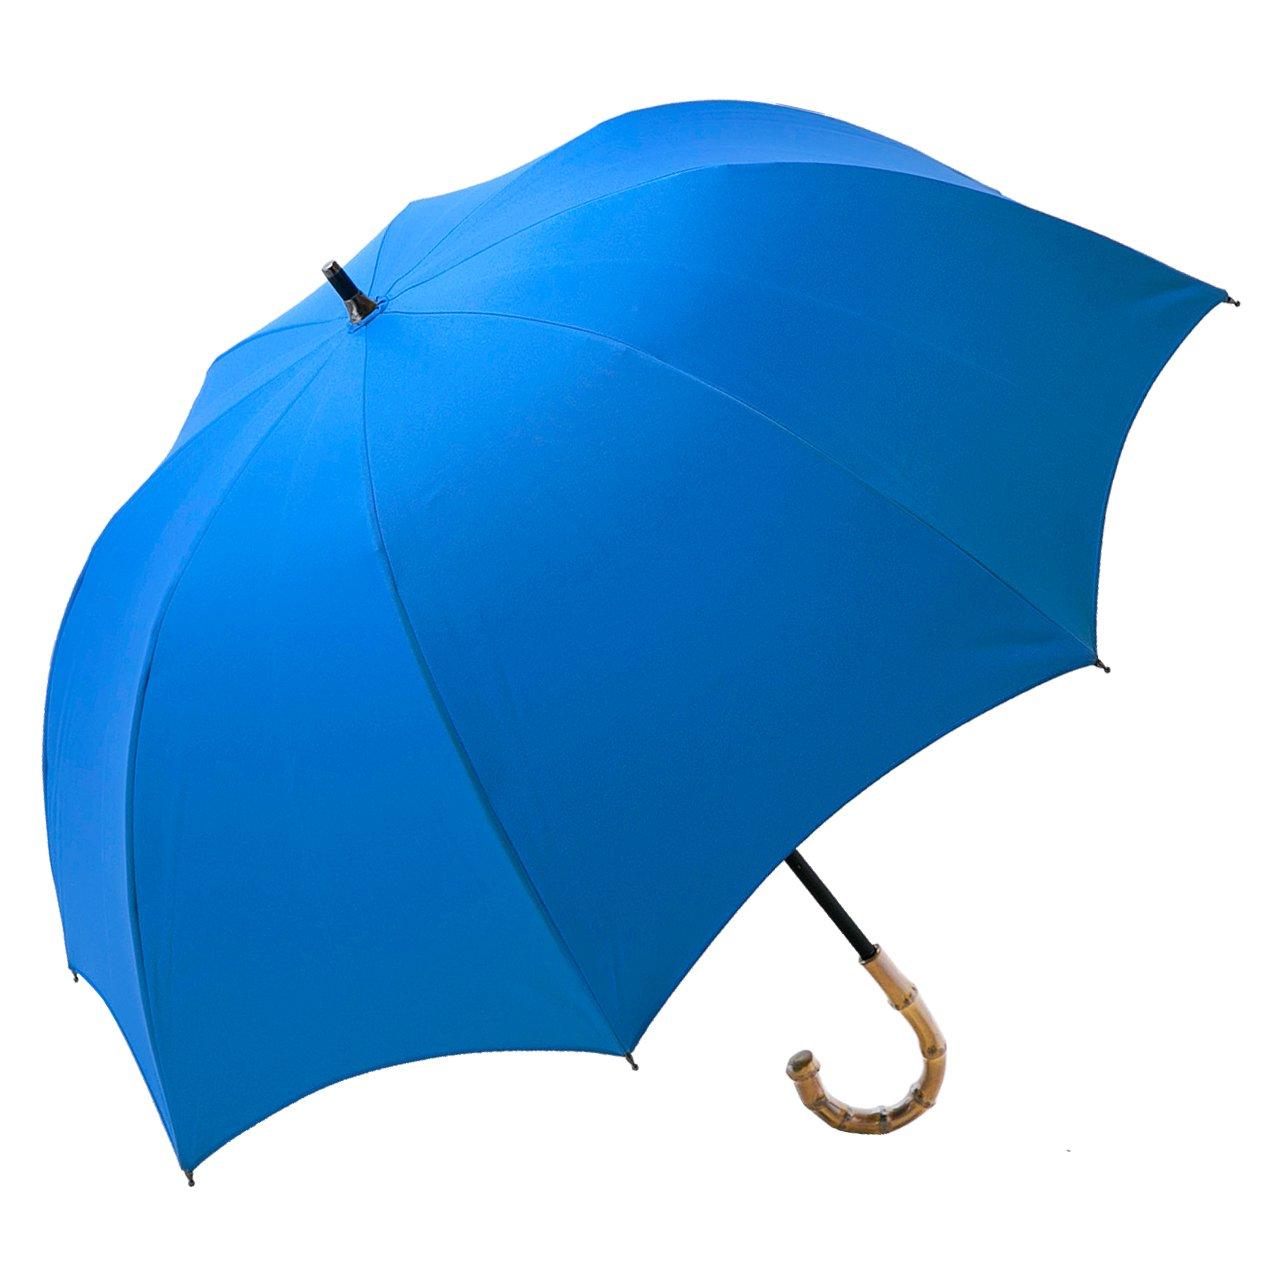 【Rose Blanc】100%完全遮光 日傘 プレーン ショートサイズ 50cm (スウィートブルー) B01ER2859E スウィートブルー スウィートブルー